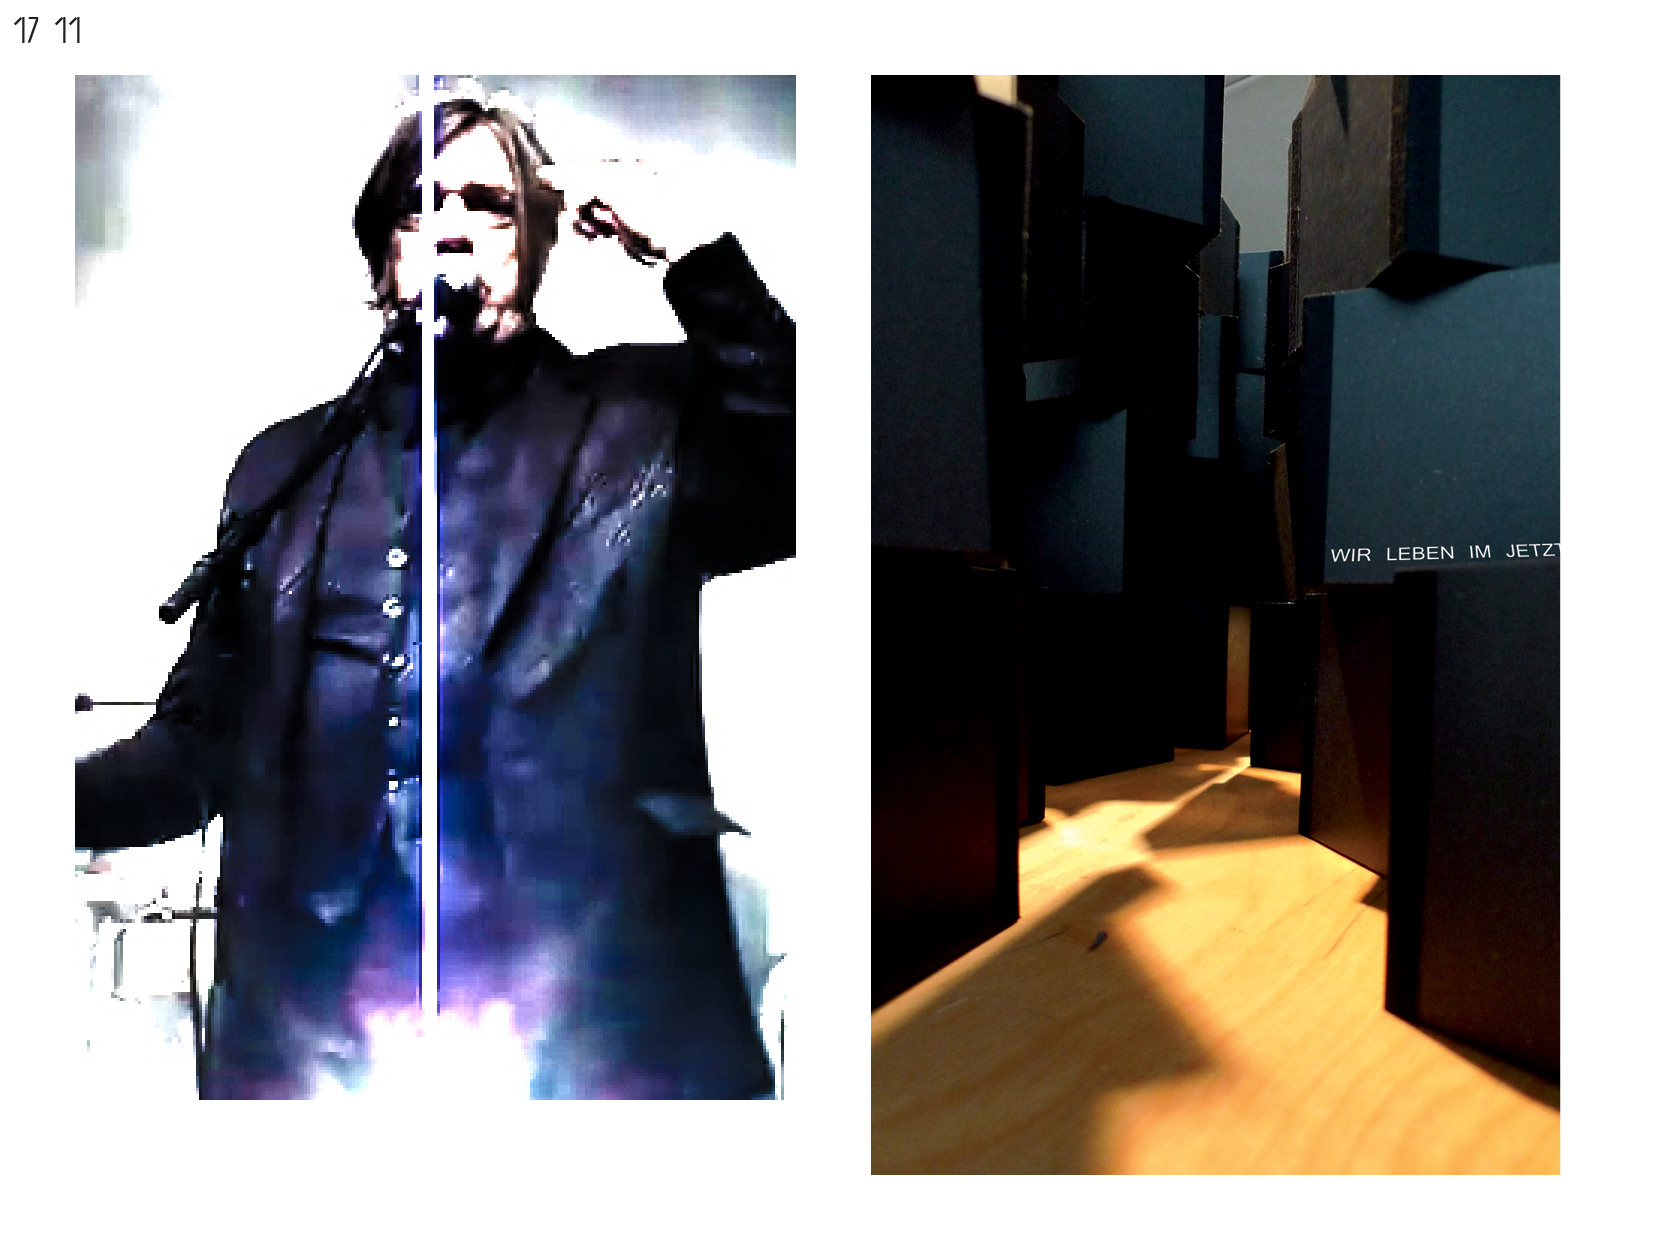 Gerrit-Schweiger-Dialog-Städte-Paris-Berlin-Jessica-Blank-Experiment-Fotoserie-Tagebuch-visuelle-Kommunikation-32